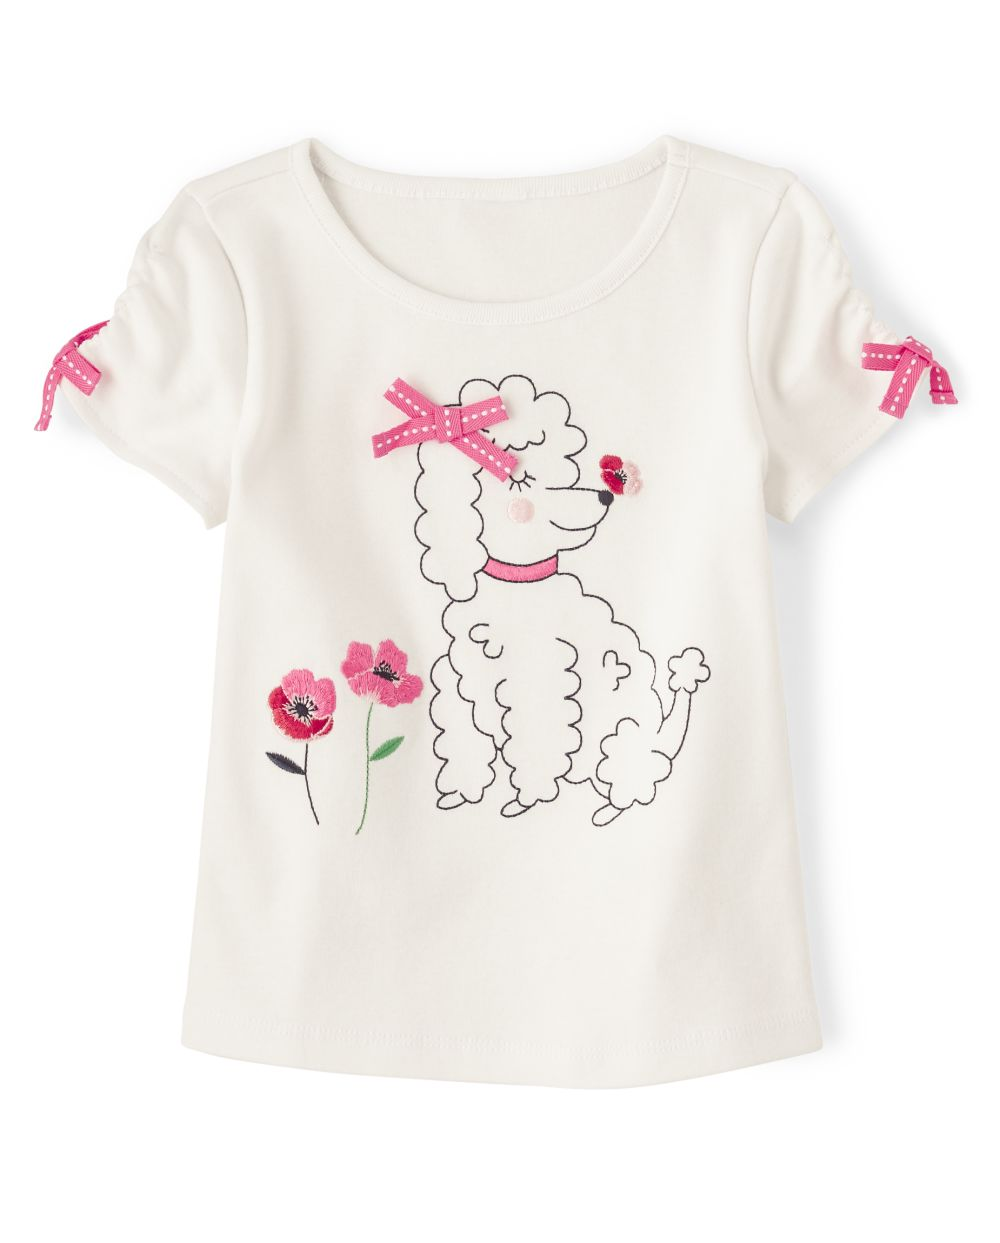 Girls Puppy Top - Playful Poppies